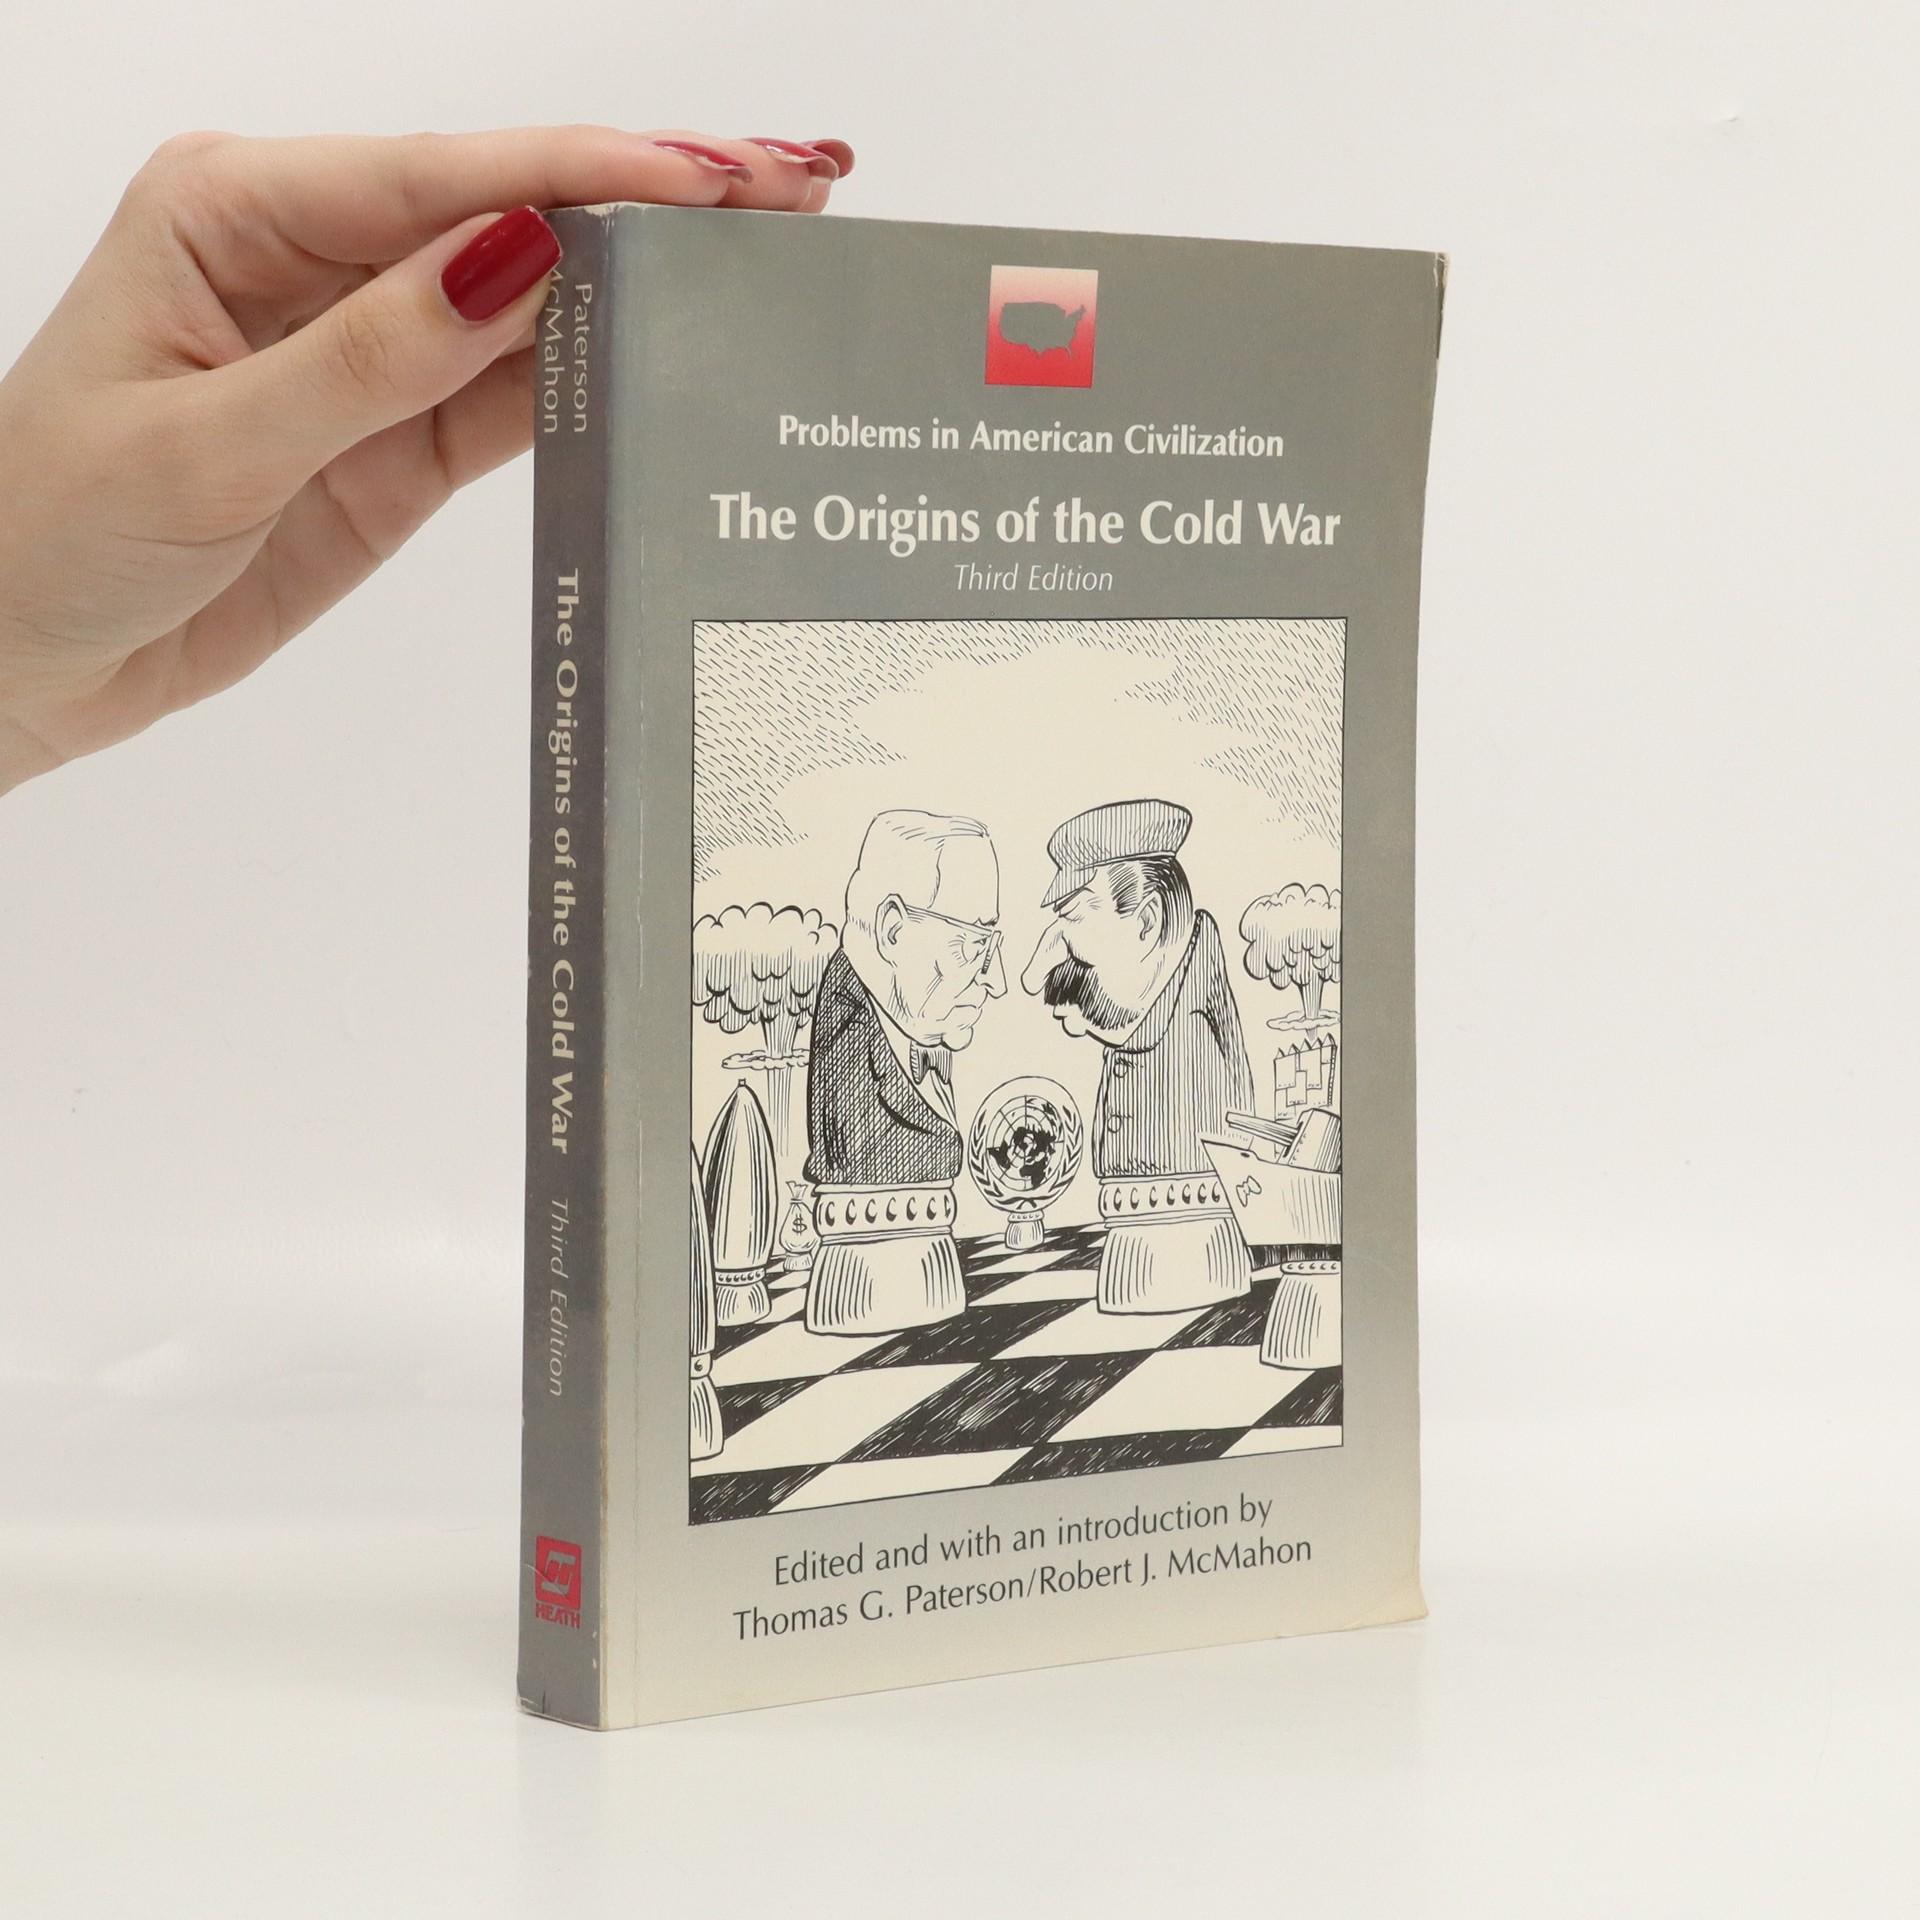 antikvární kniha The origins of the Cold War, 1991